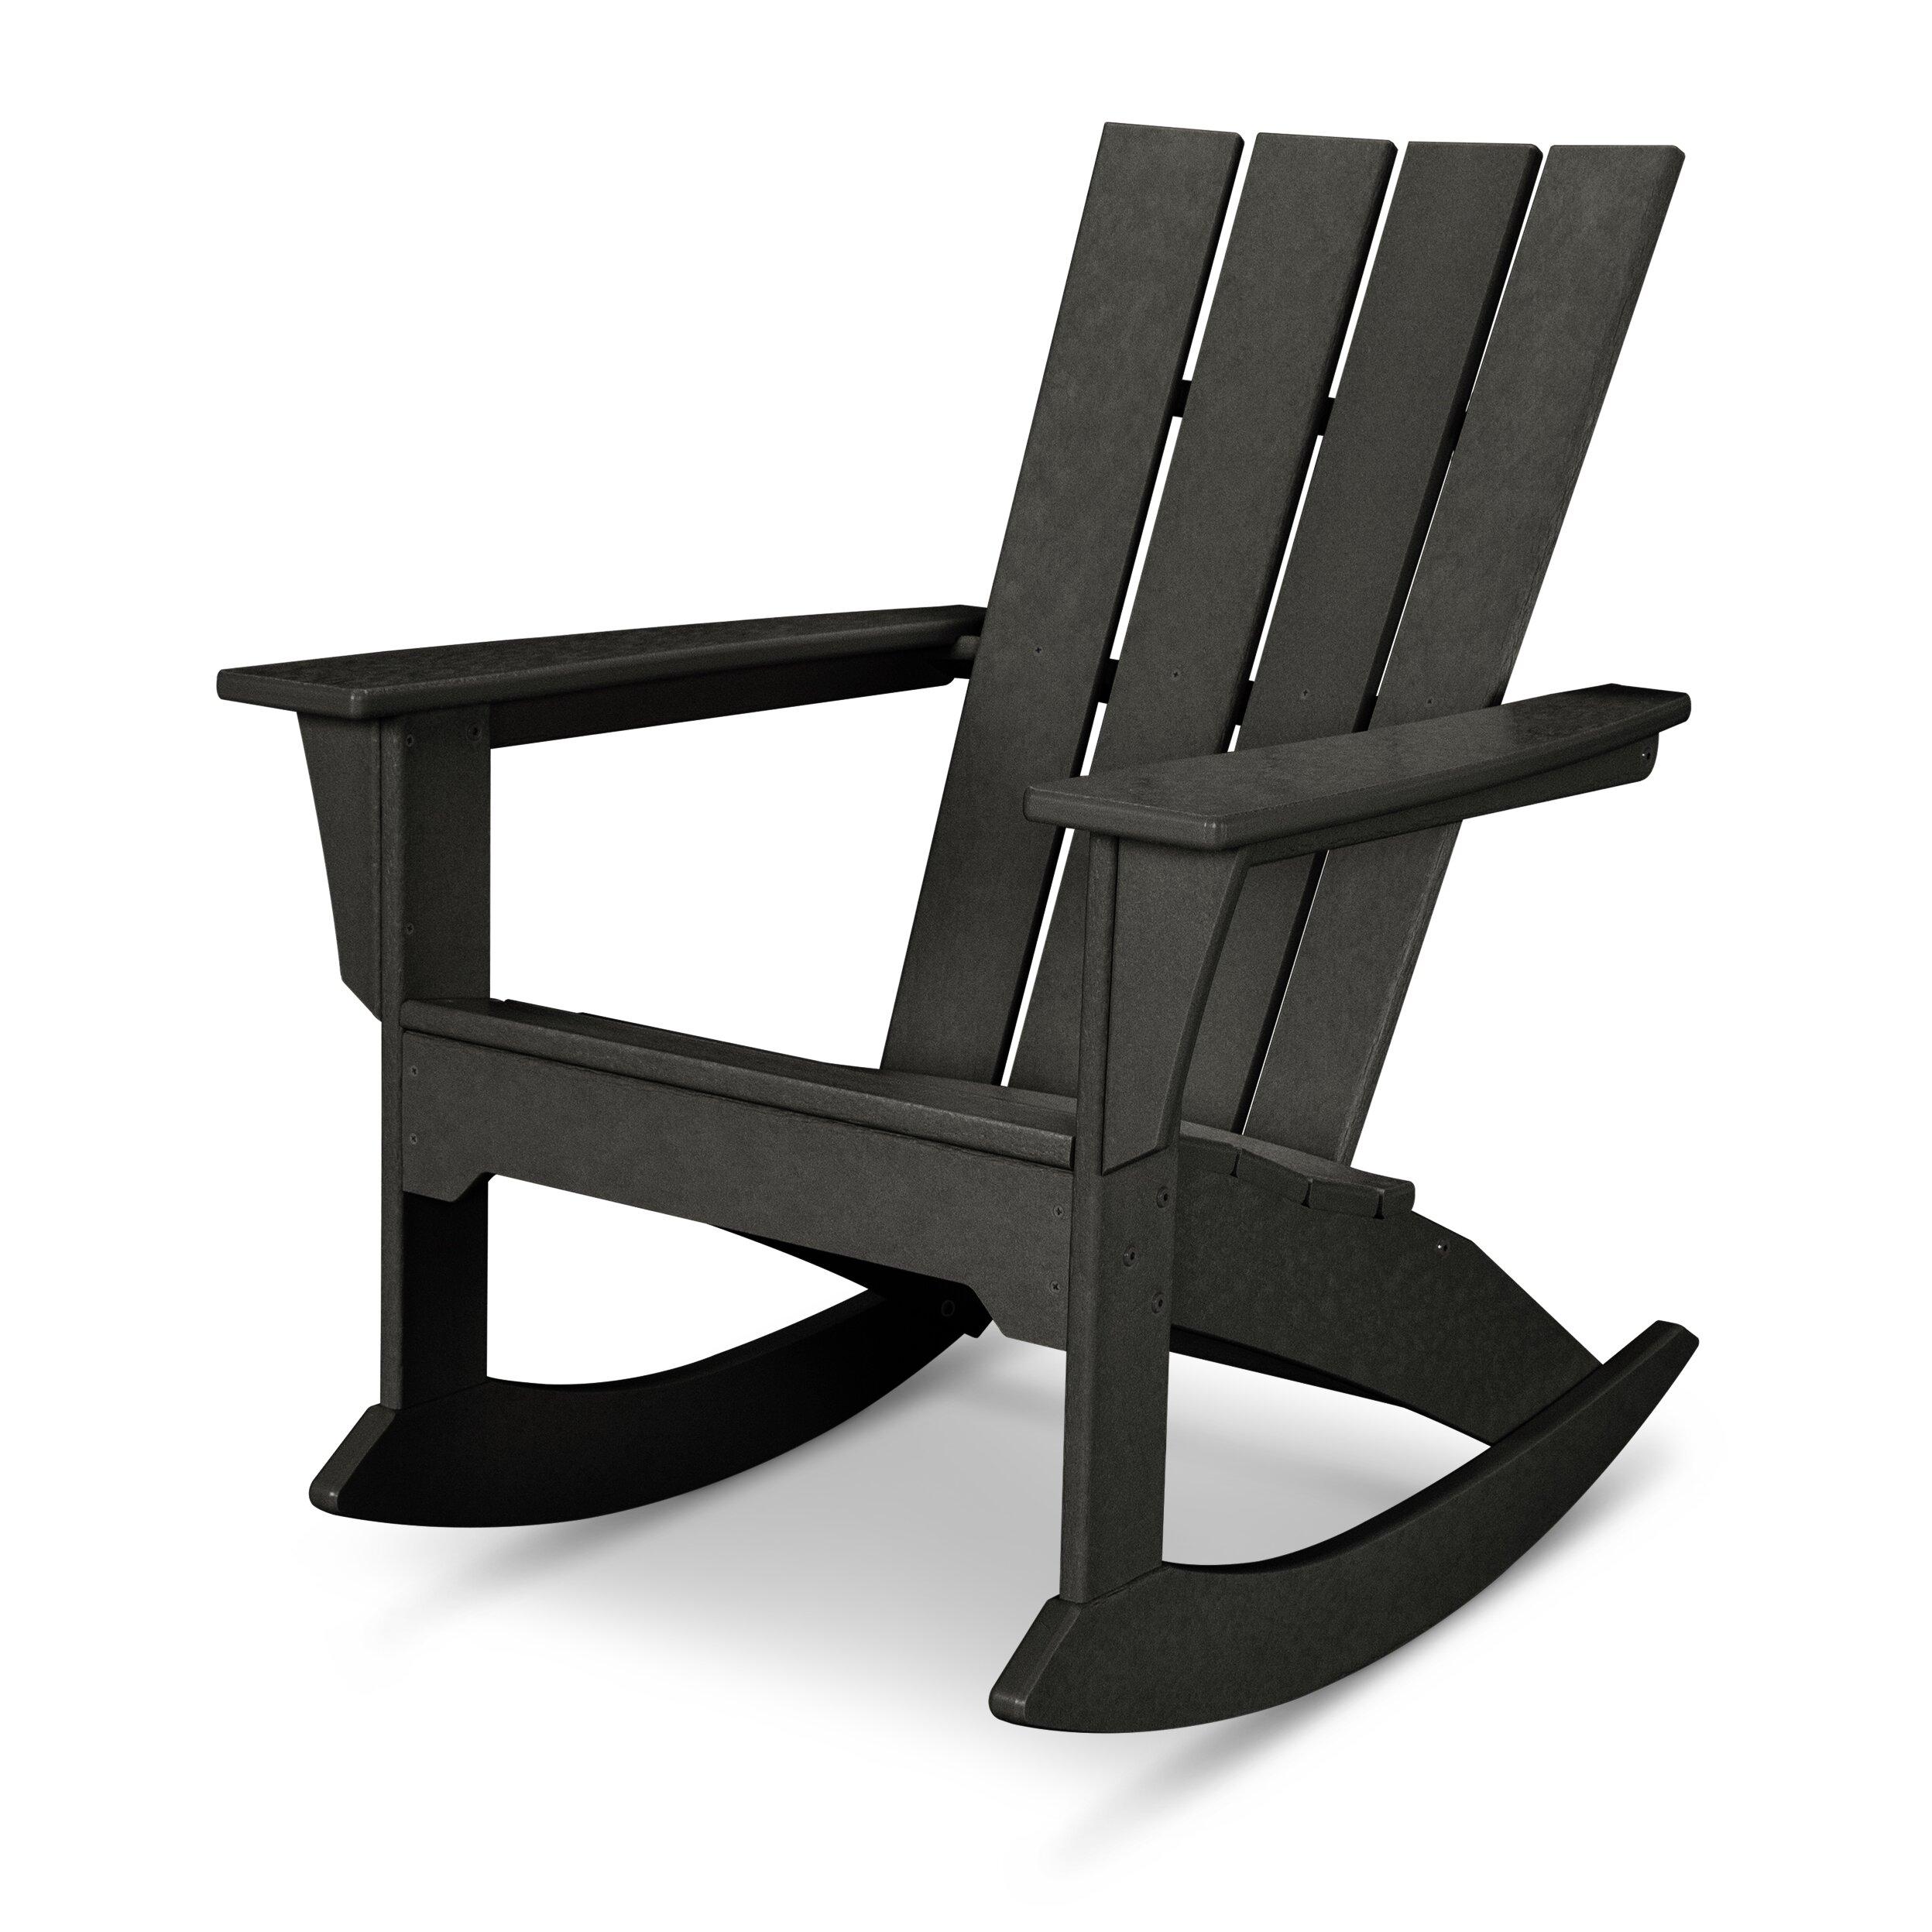 POLYWOOD174 Quattro Adirondack Rocker Chair amp Reviews Wayfair : Quattro Adirondack Rocker Chair QNR10 from www.wayfair.com size 2495 x 2495 jpeg 556kB